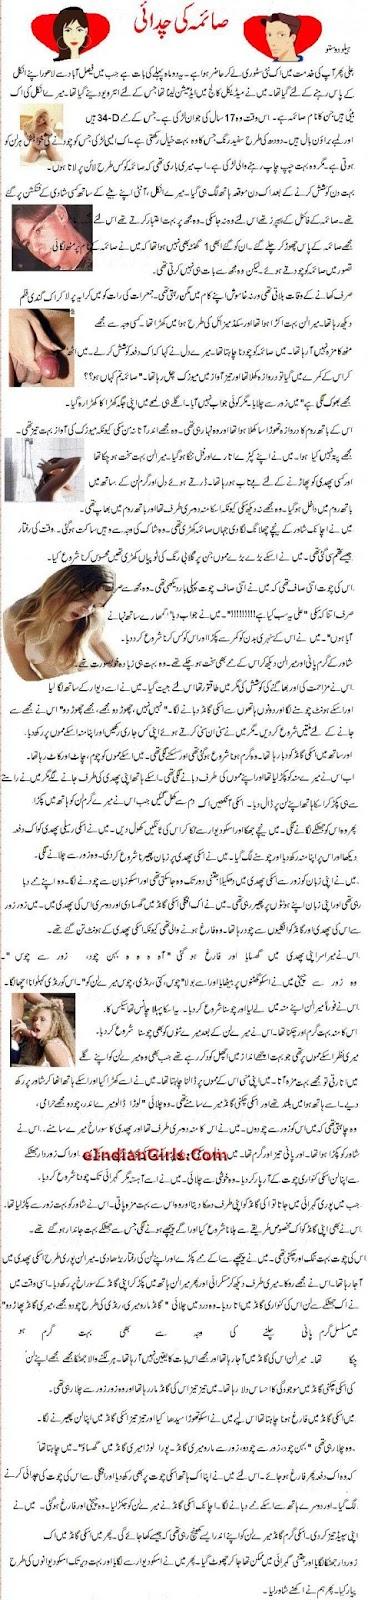 urdu sexy stories hindi sex stories saima ki chudai urdu font